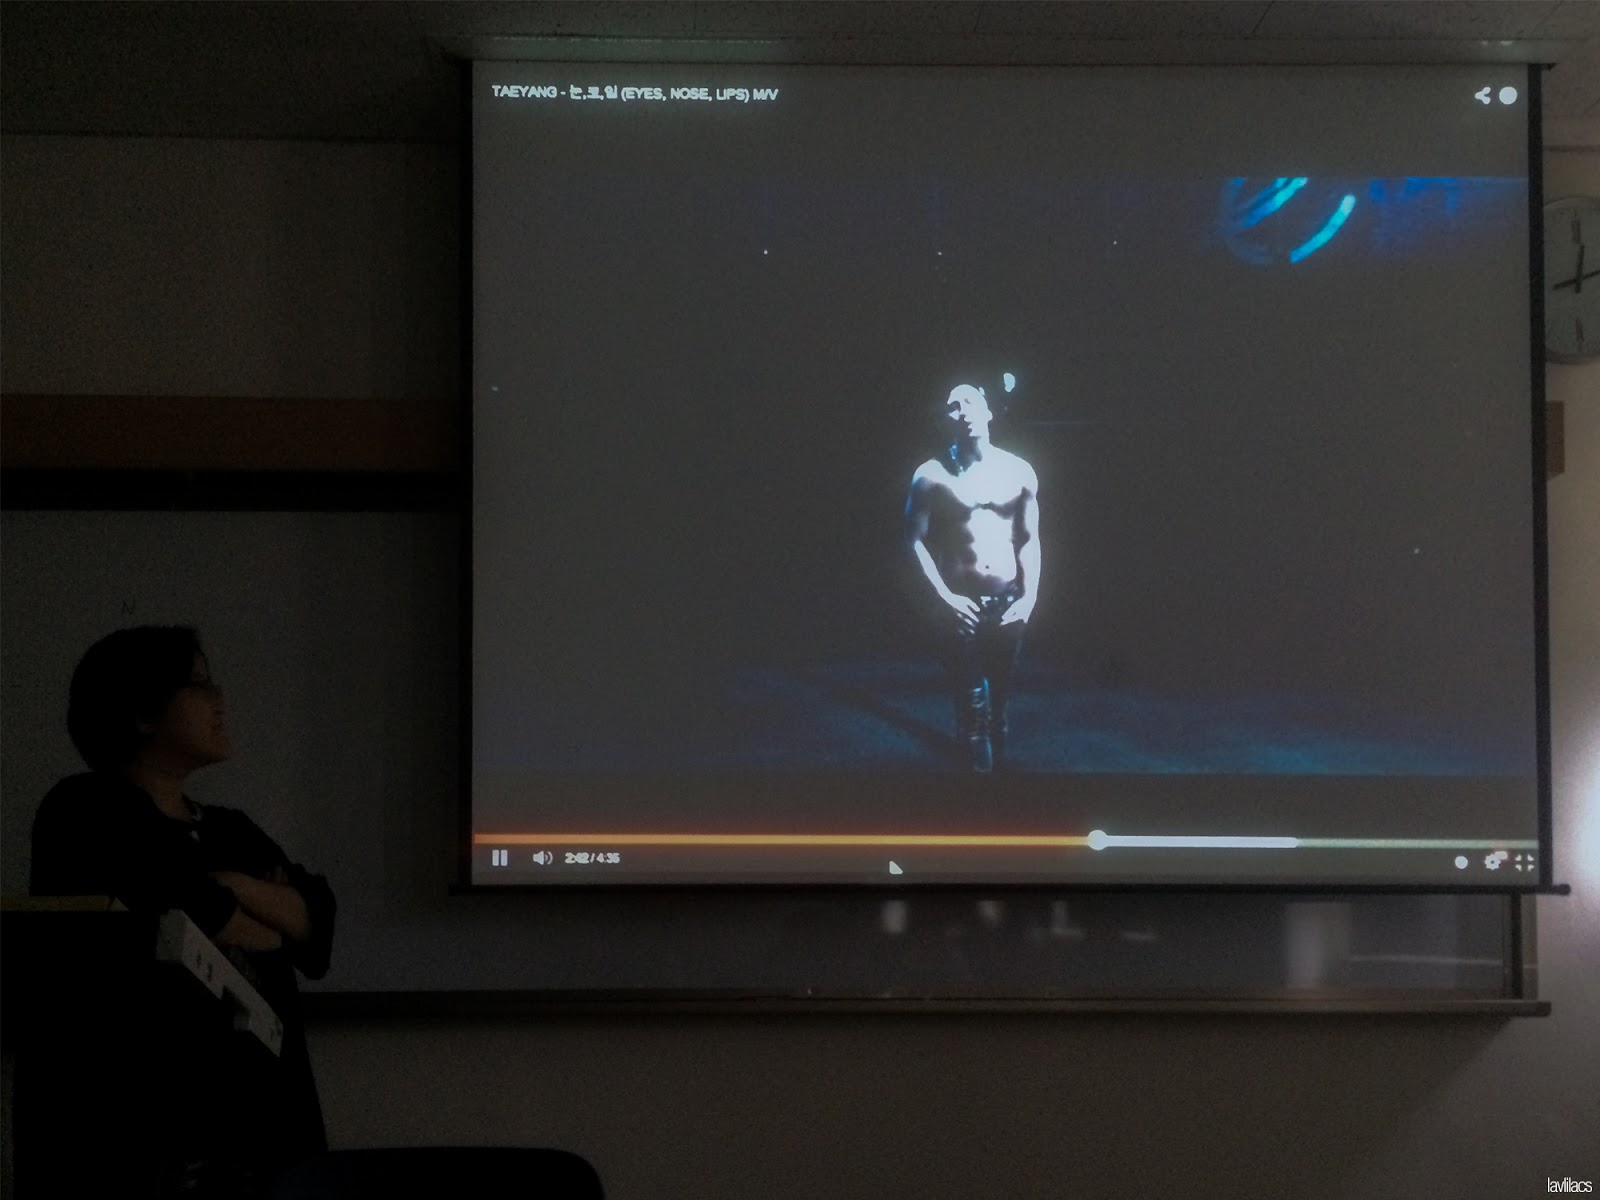 Seoul, Korea - Summer Study Abroad 2014 - Watching Taeyang in class